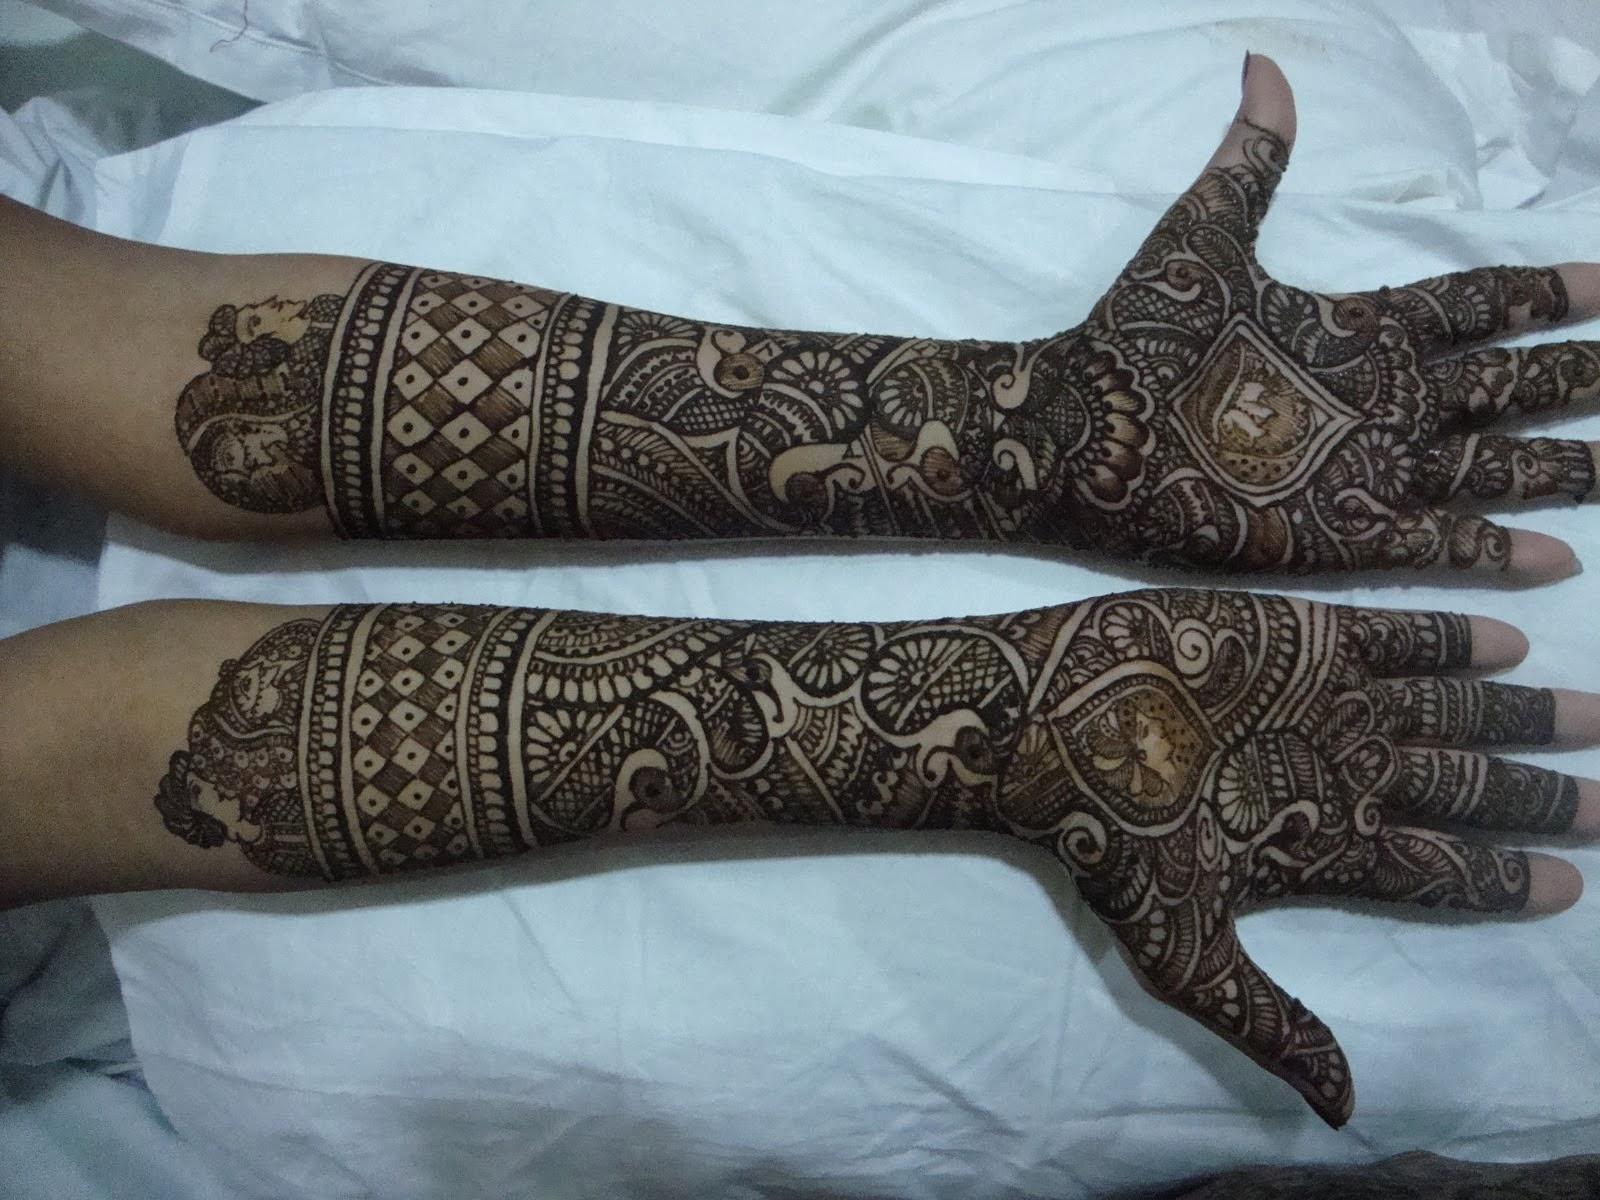 Indian Bridal Mehndi Design Photos Hd Wallpaper Collection Page 1